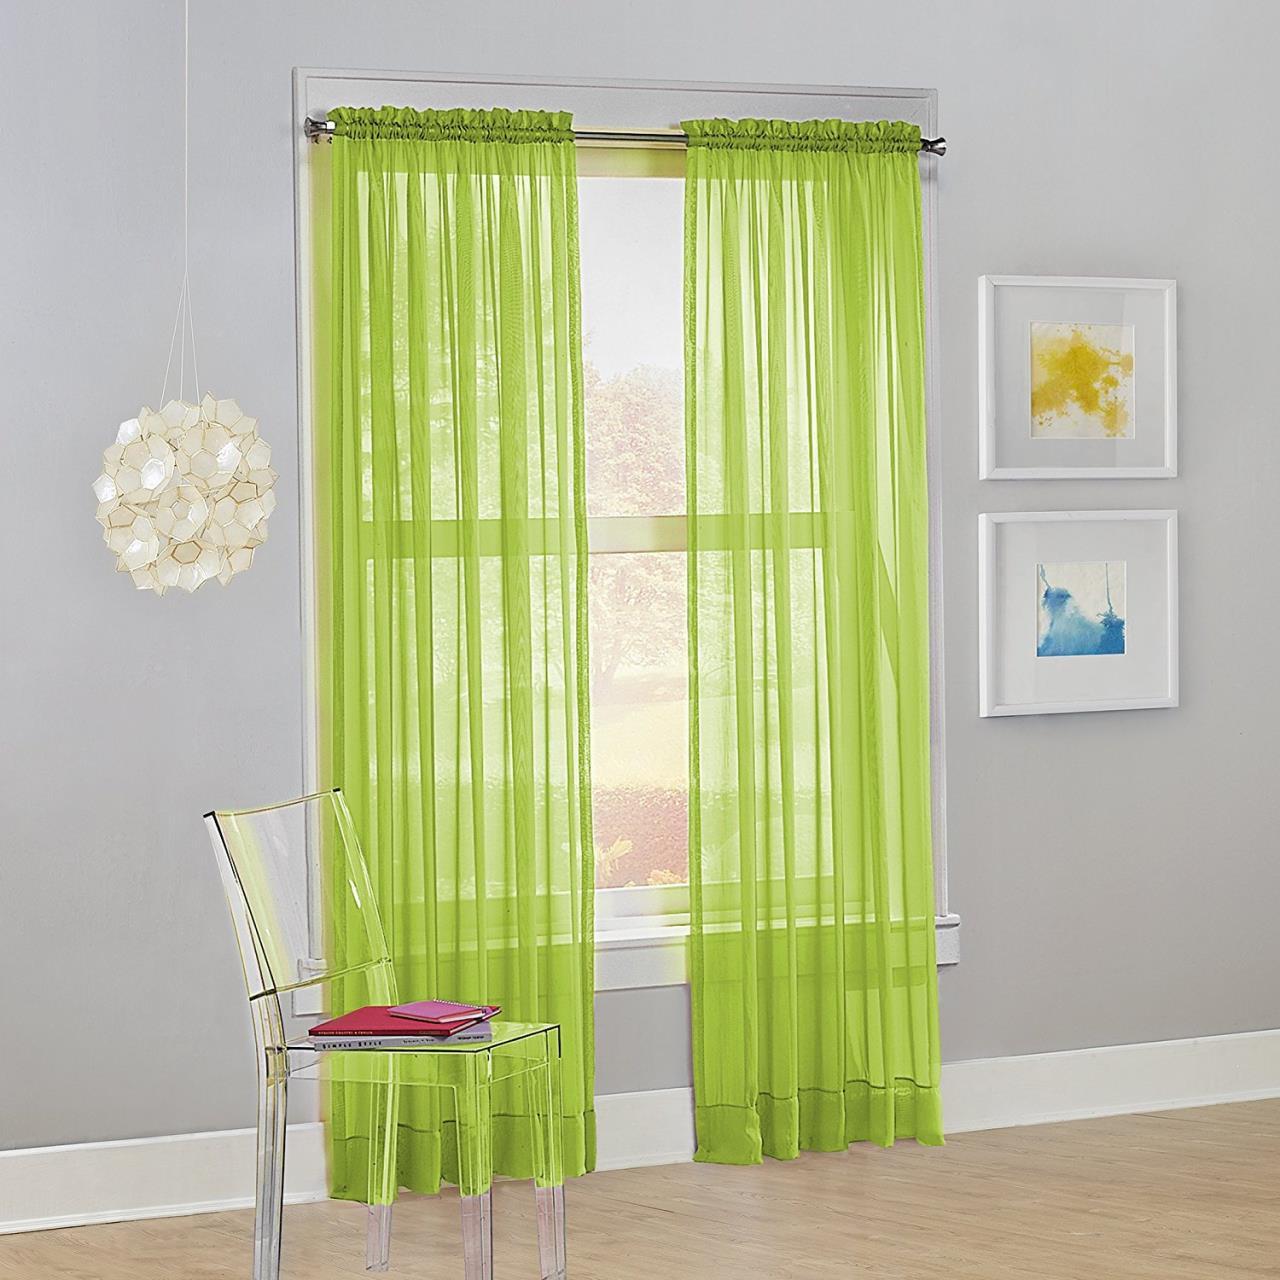 Calypso Sheer Curtain - 29927248906